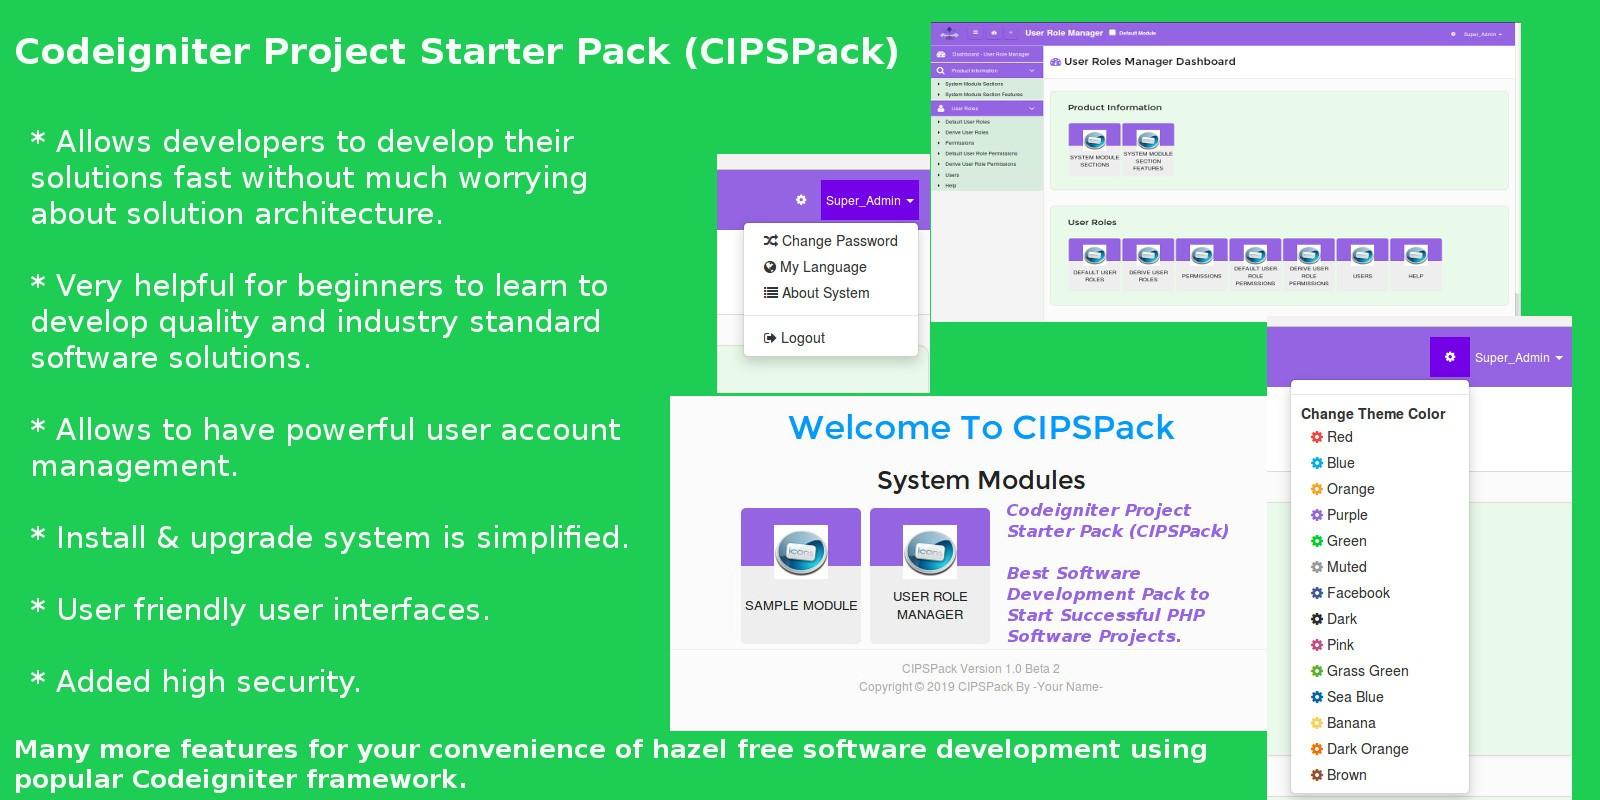 PHP Software Development Pack Using Codeigniter